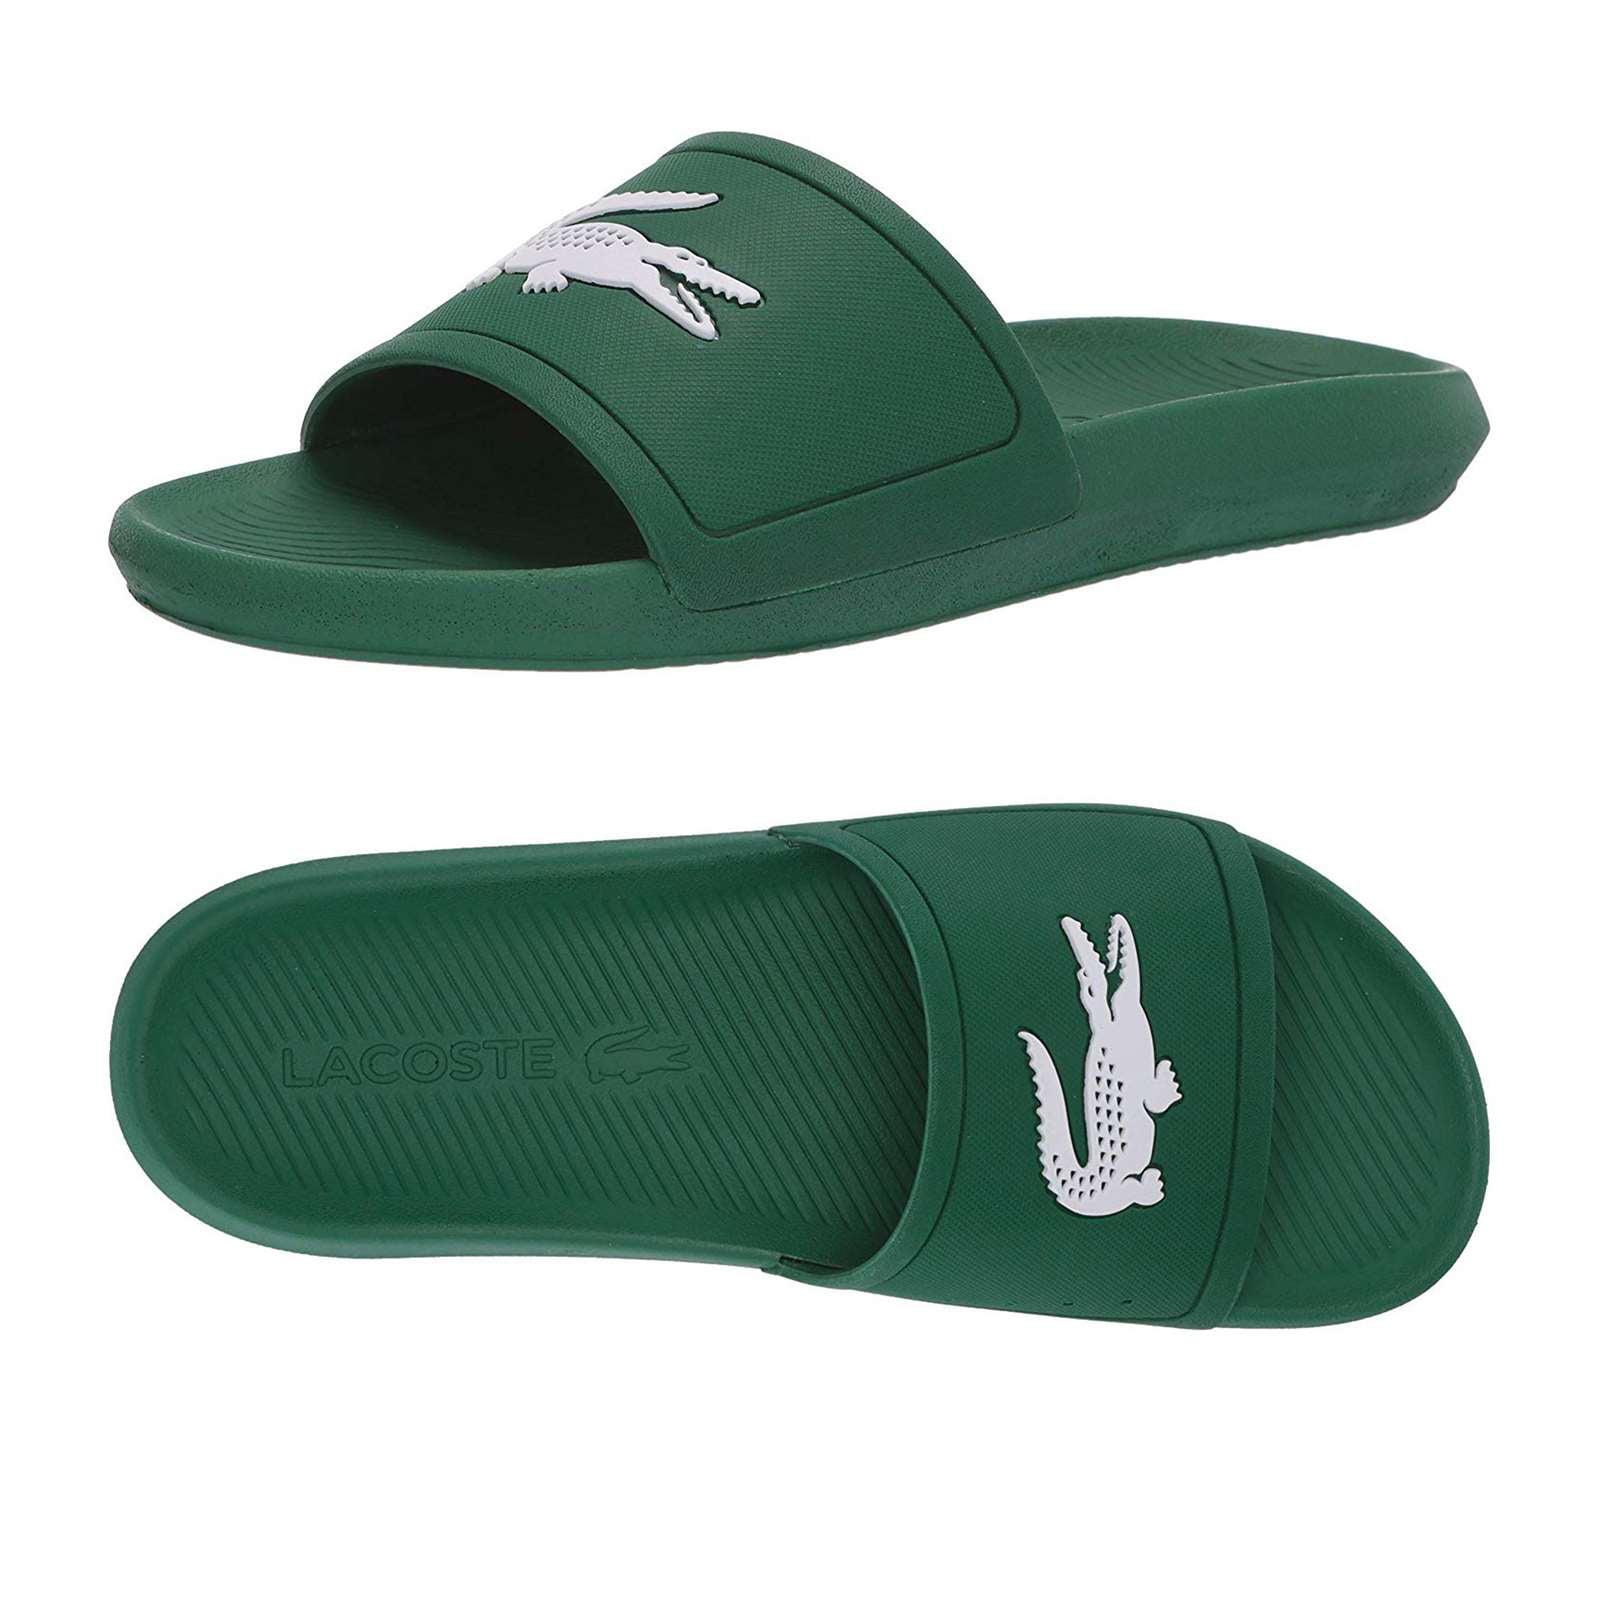 Lacoste Men Croco Slide Sandals